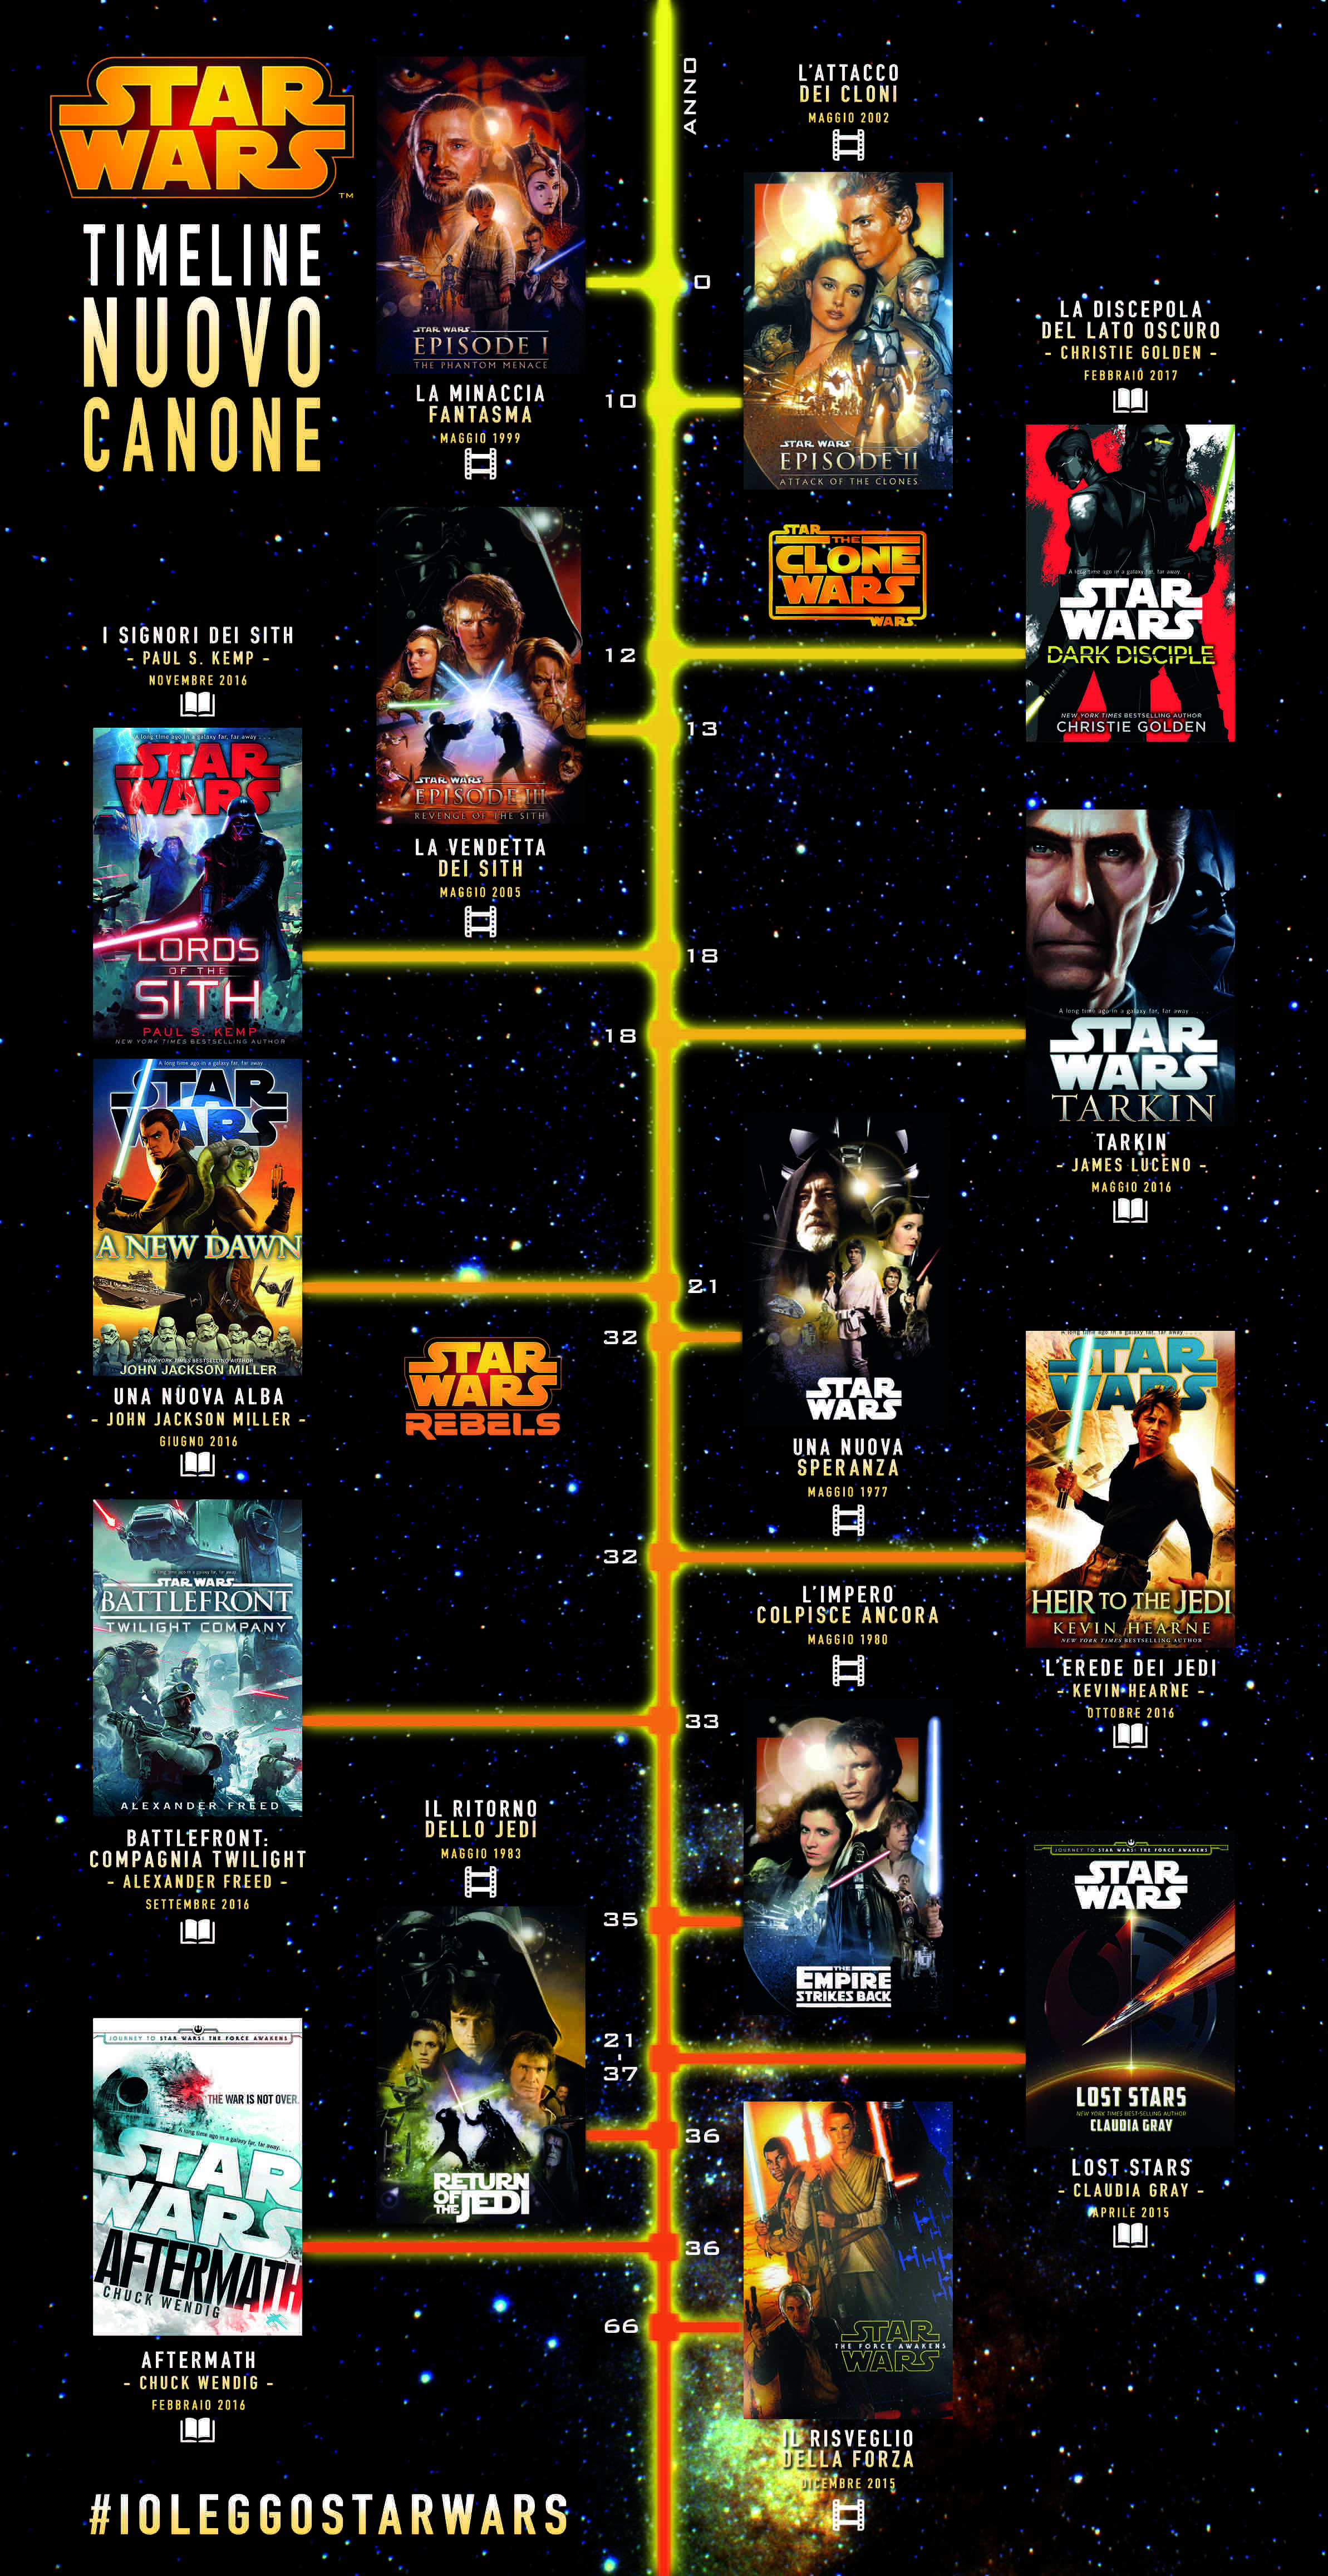 Timeline Nuovo Canone